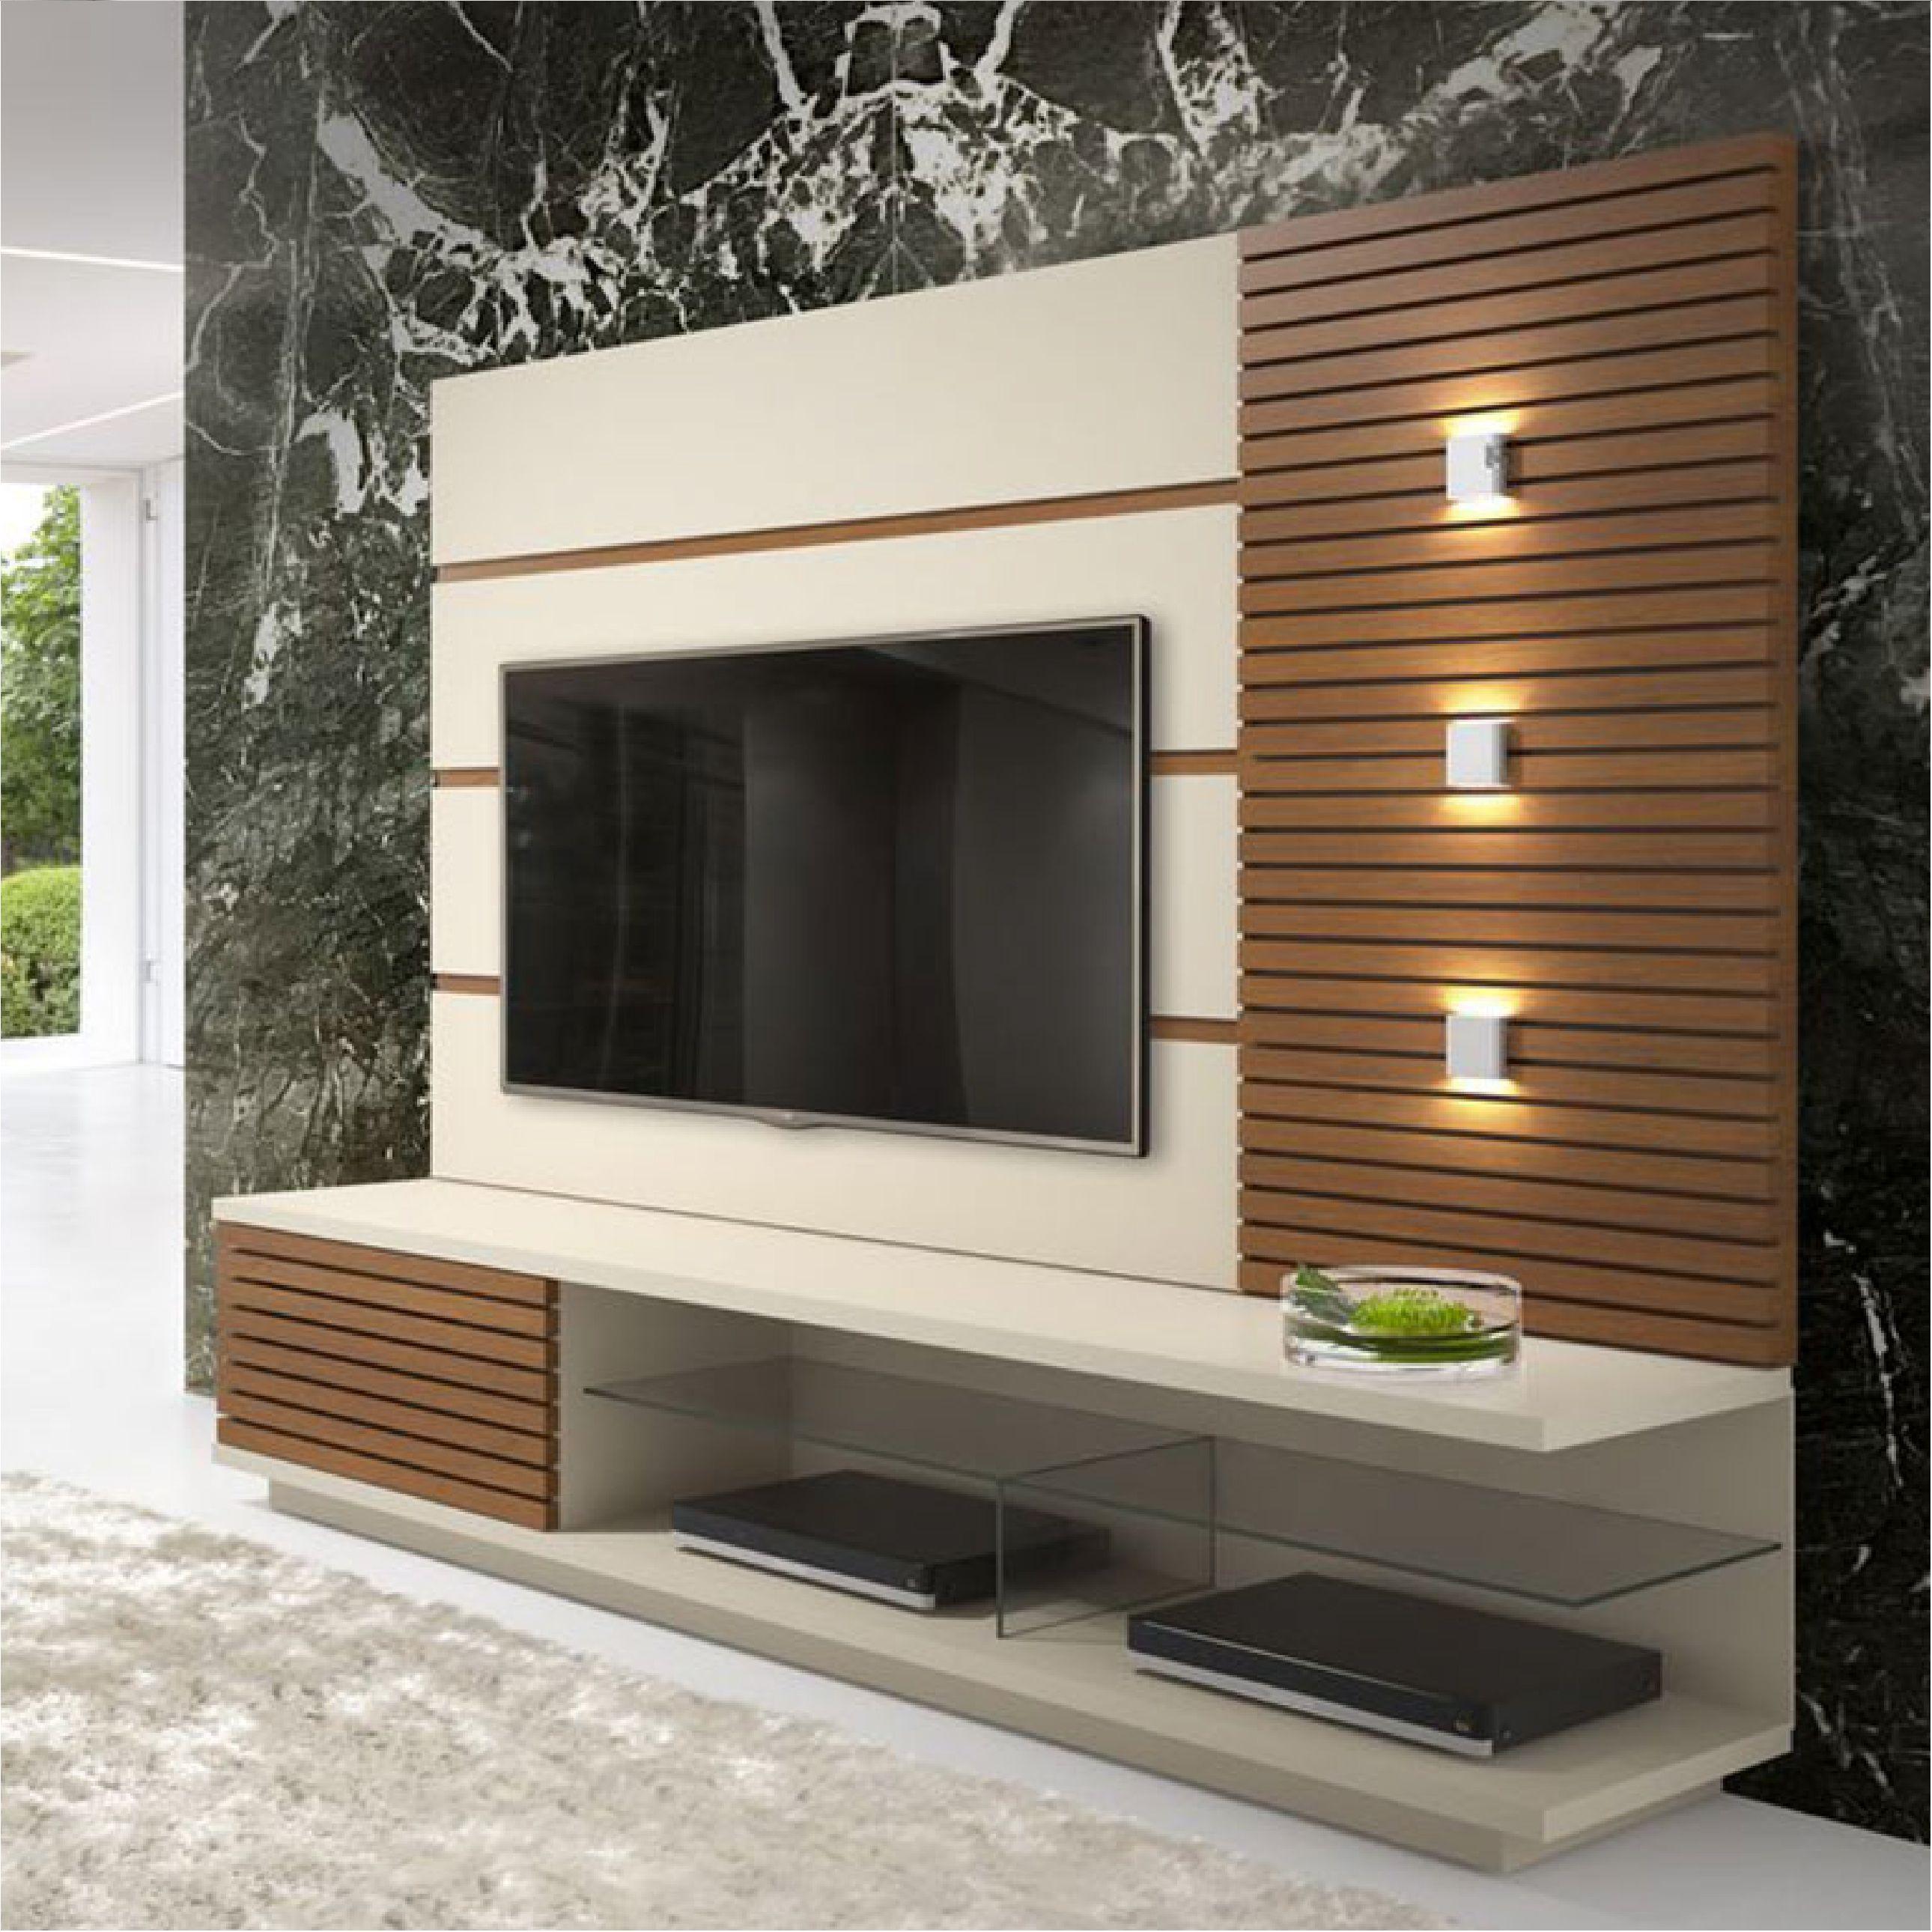 طاولة قبوتلفزيون craftidea org modern tv wall units on incredible tv wall design ideas for living room decor layouts of tv models id=70159